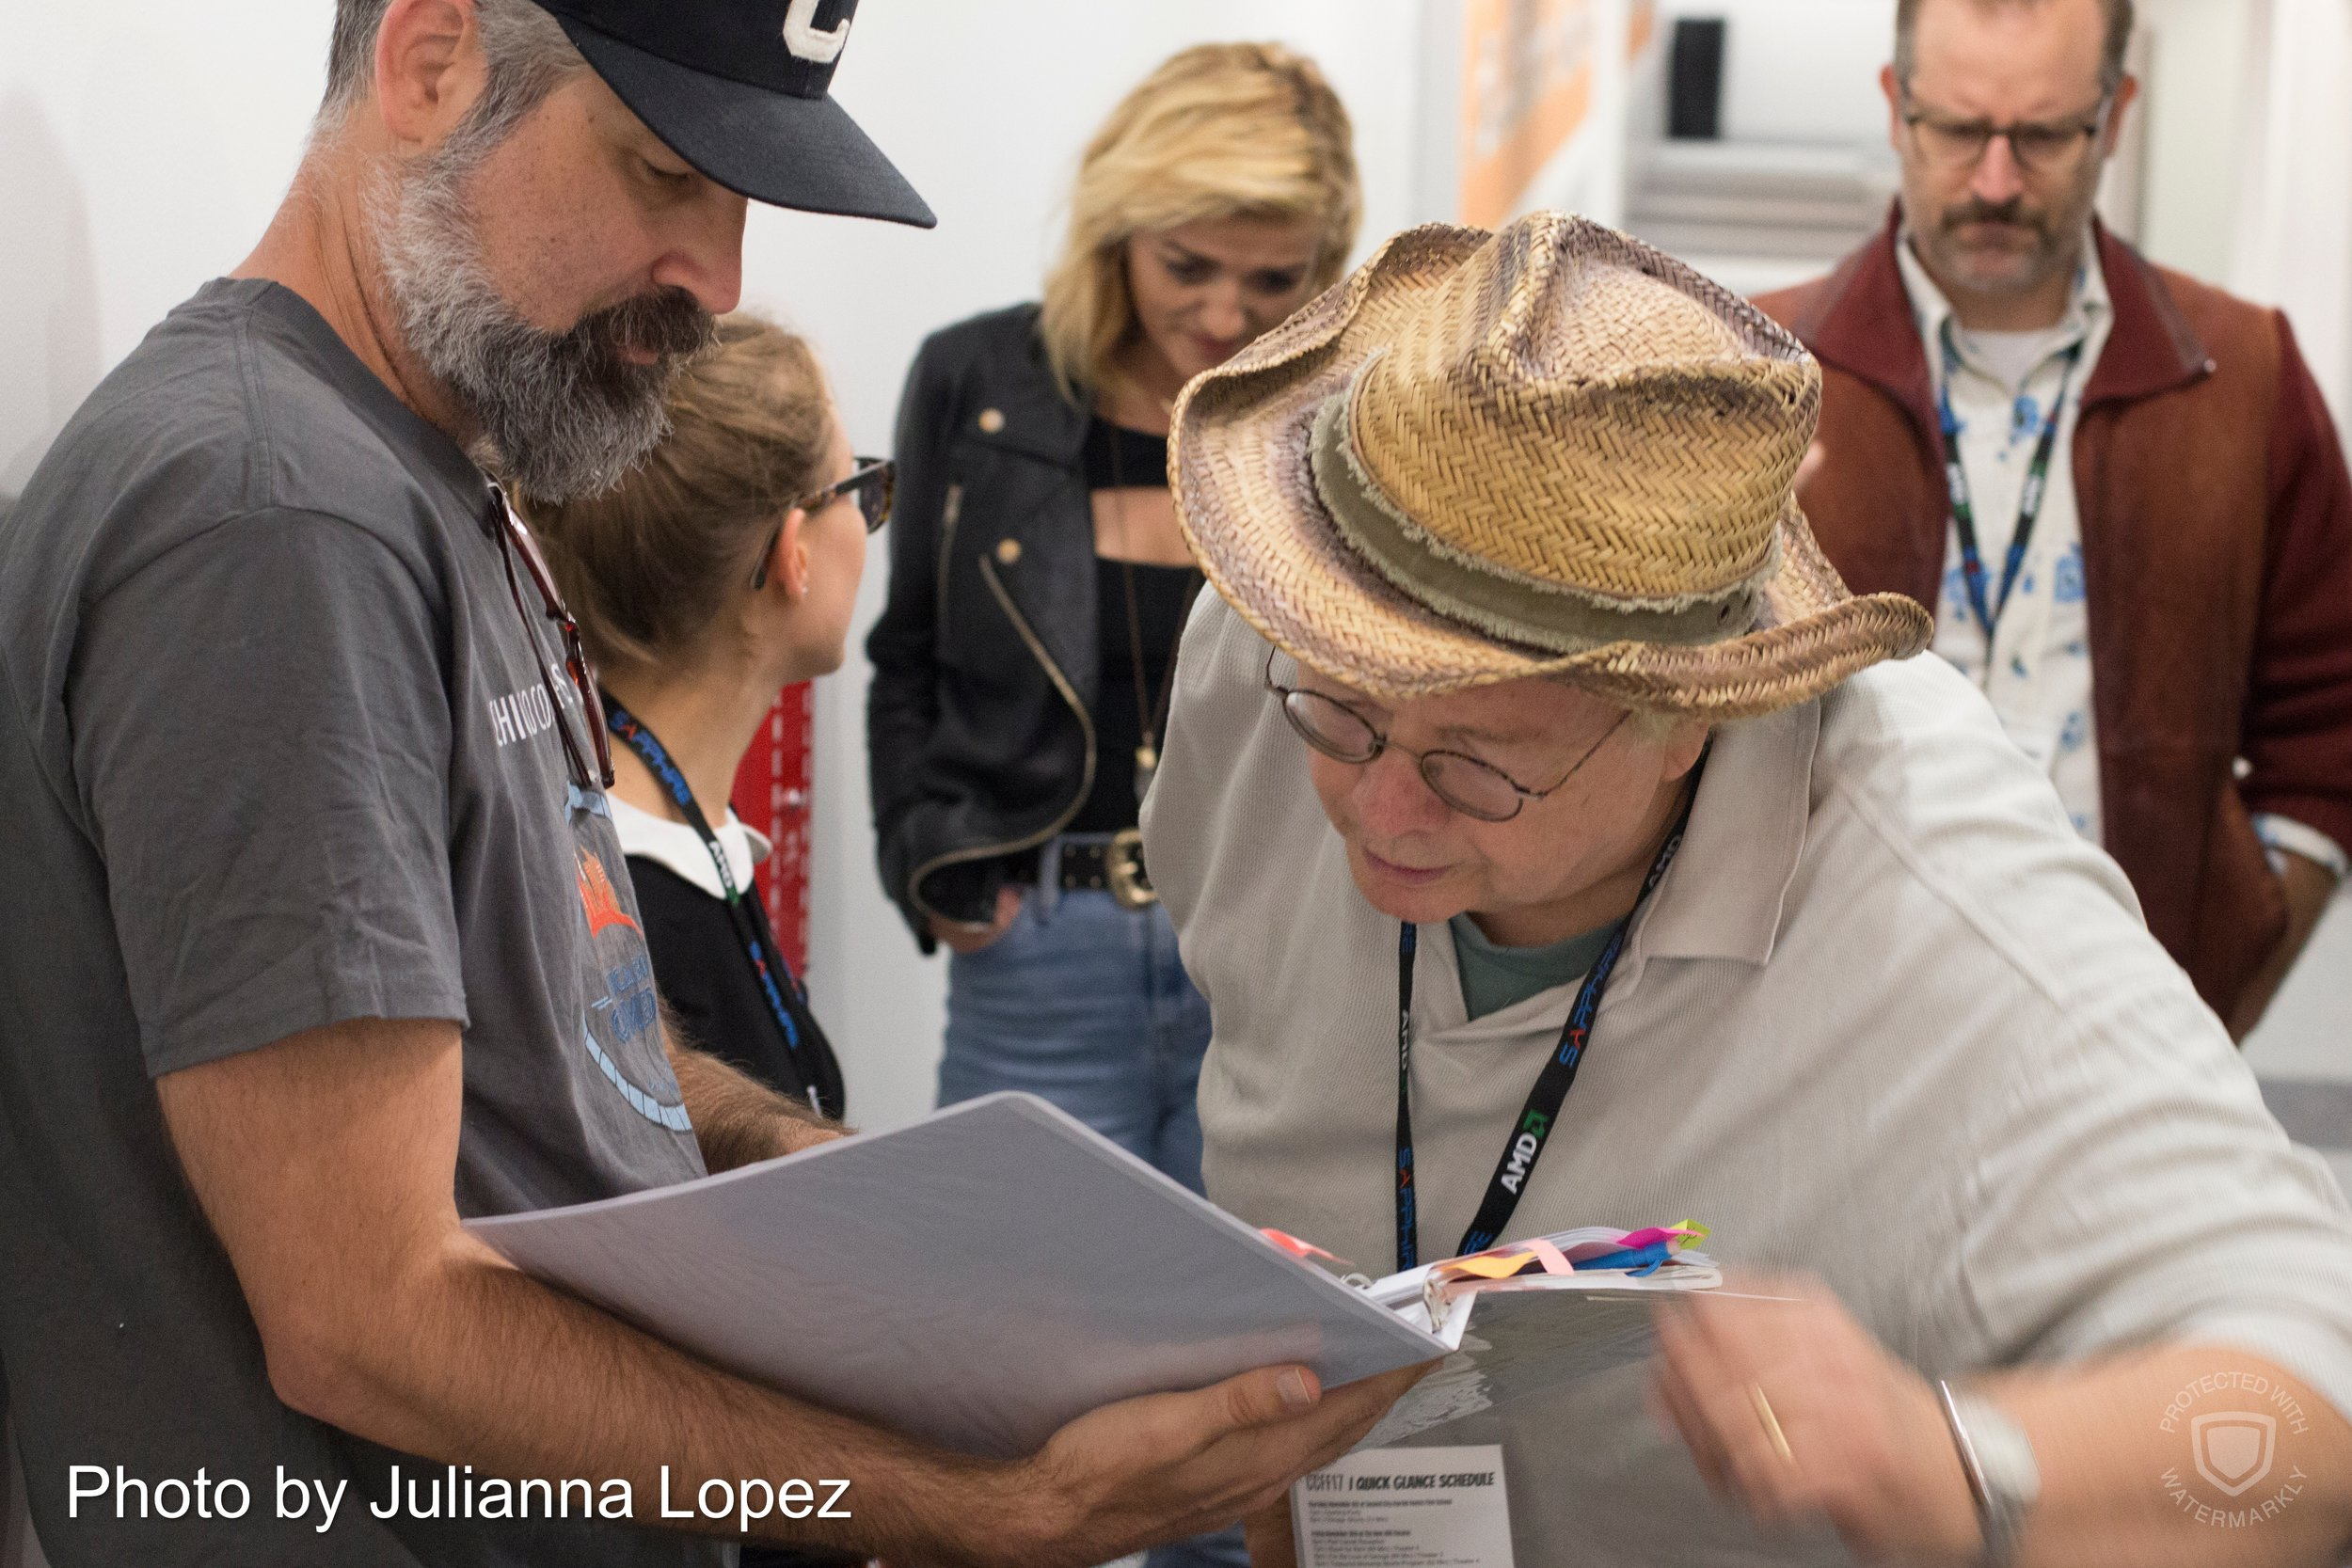 Julianna Lopez - IMG_6335.jpg